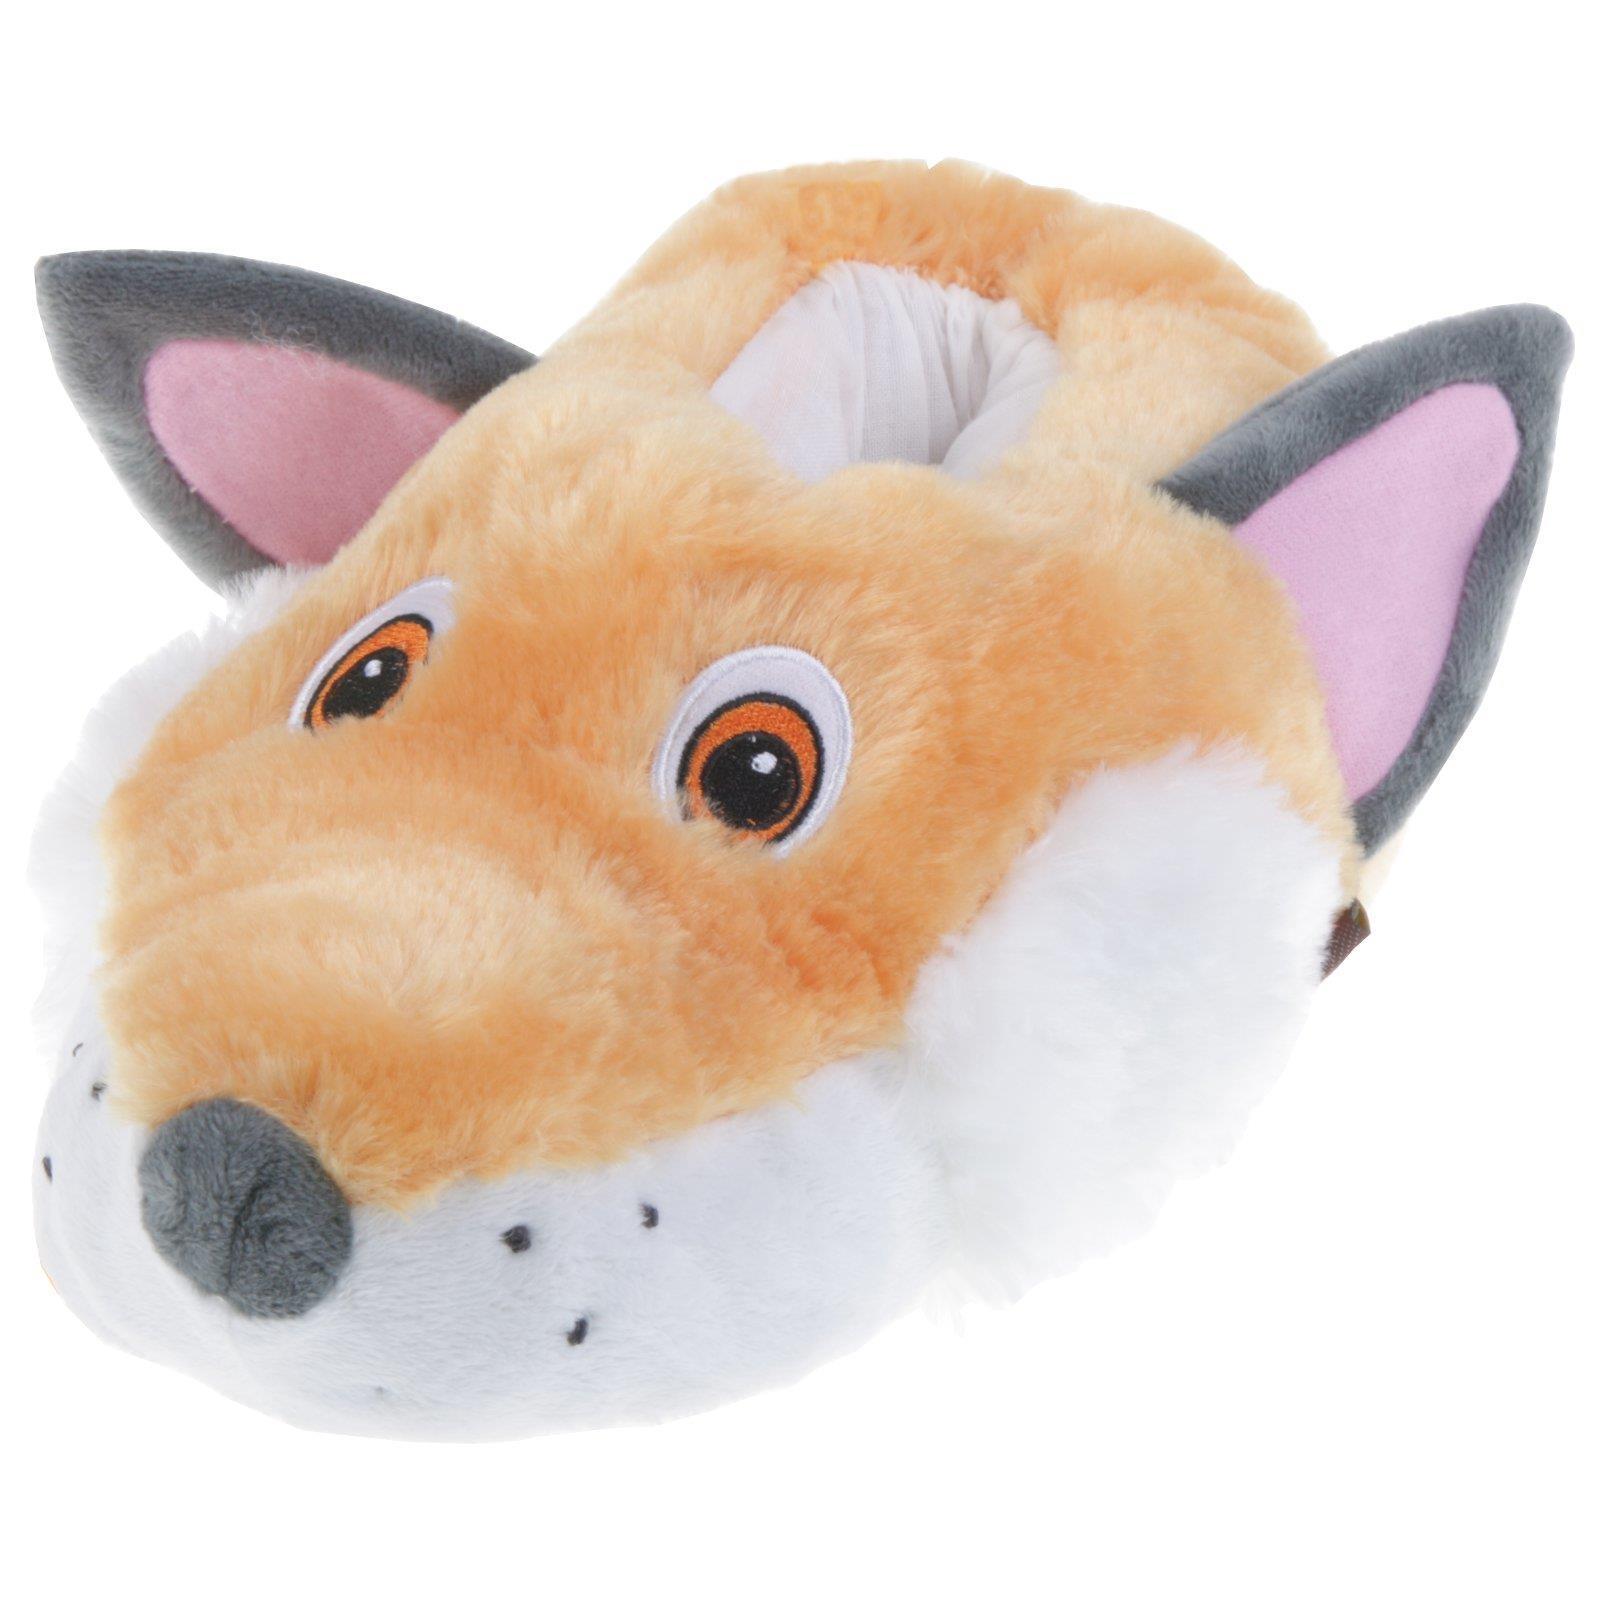 Fuchs Tier Hausschuhe Pantoffel Schlappen Kuscheltier Plüsch Kinder Grau 29-35